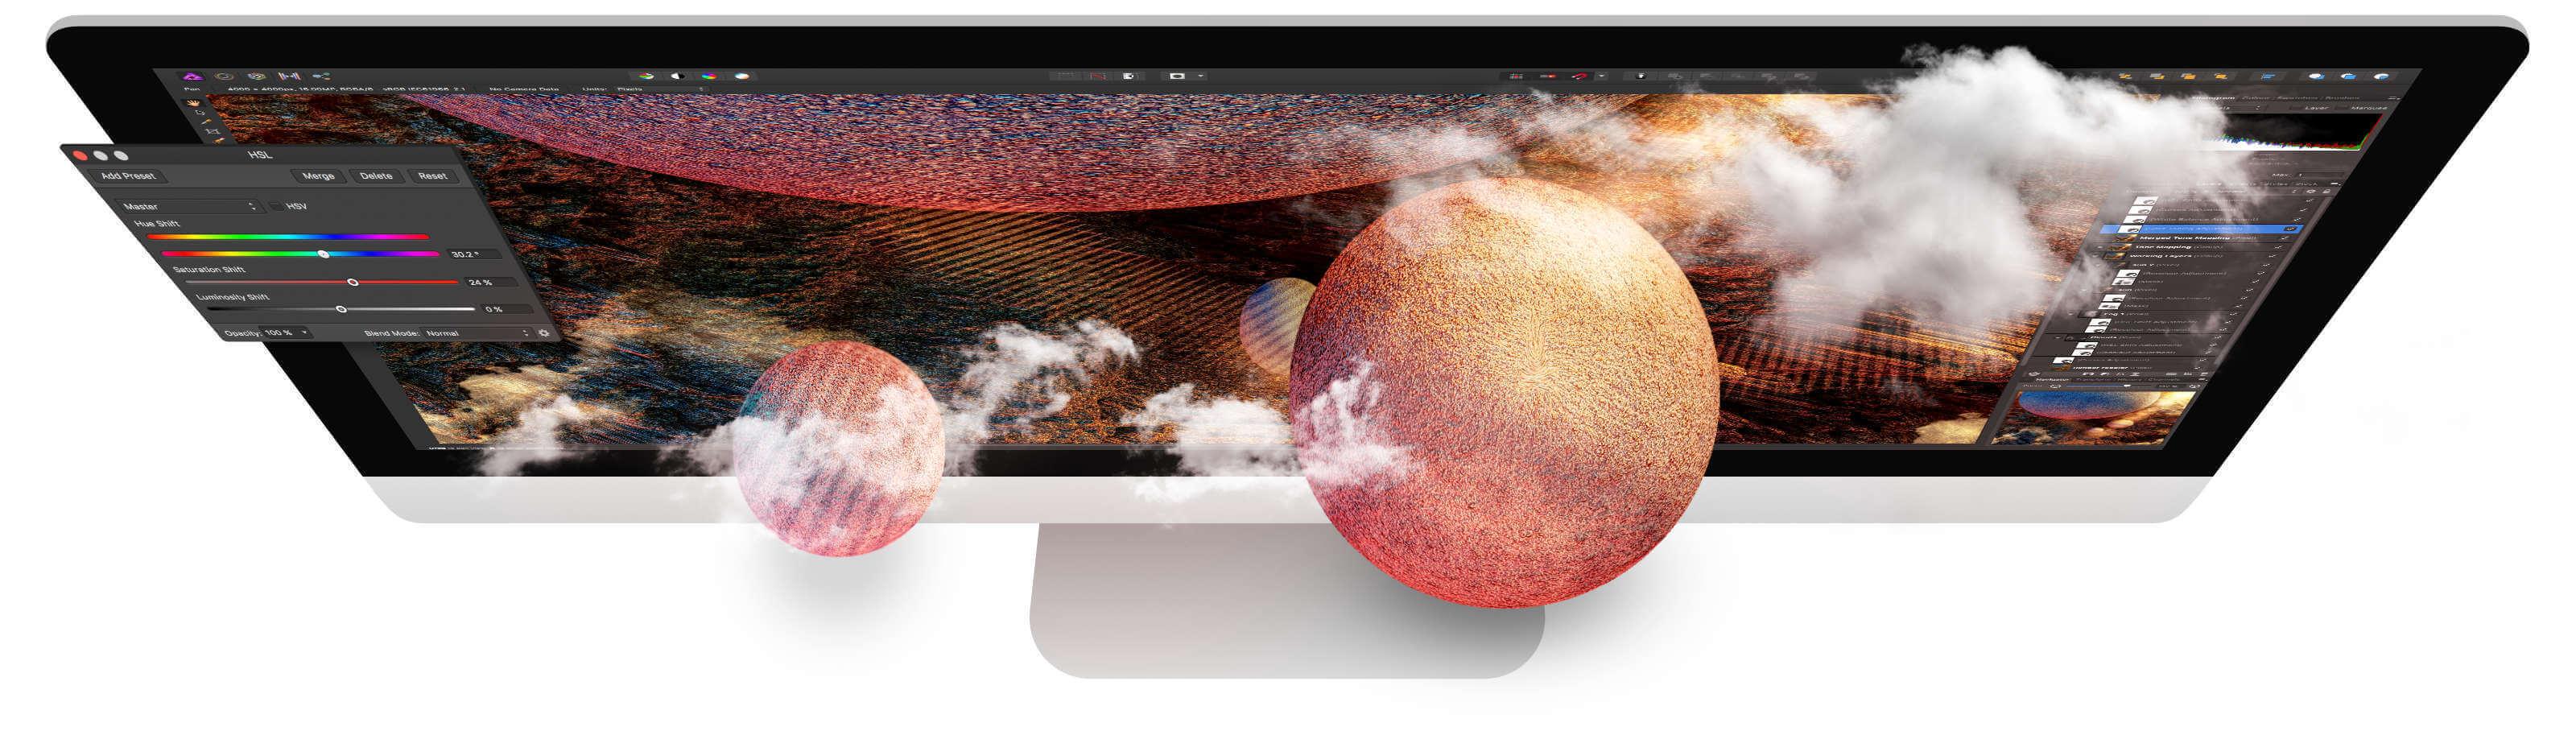 >Affinity Photo V 1.9.1 MAC & V1.8.0.532 WIN – 完美的Photoshop替代方案